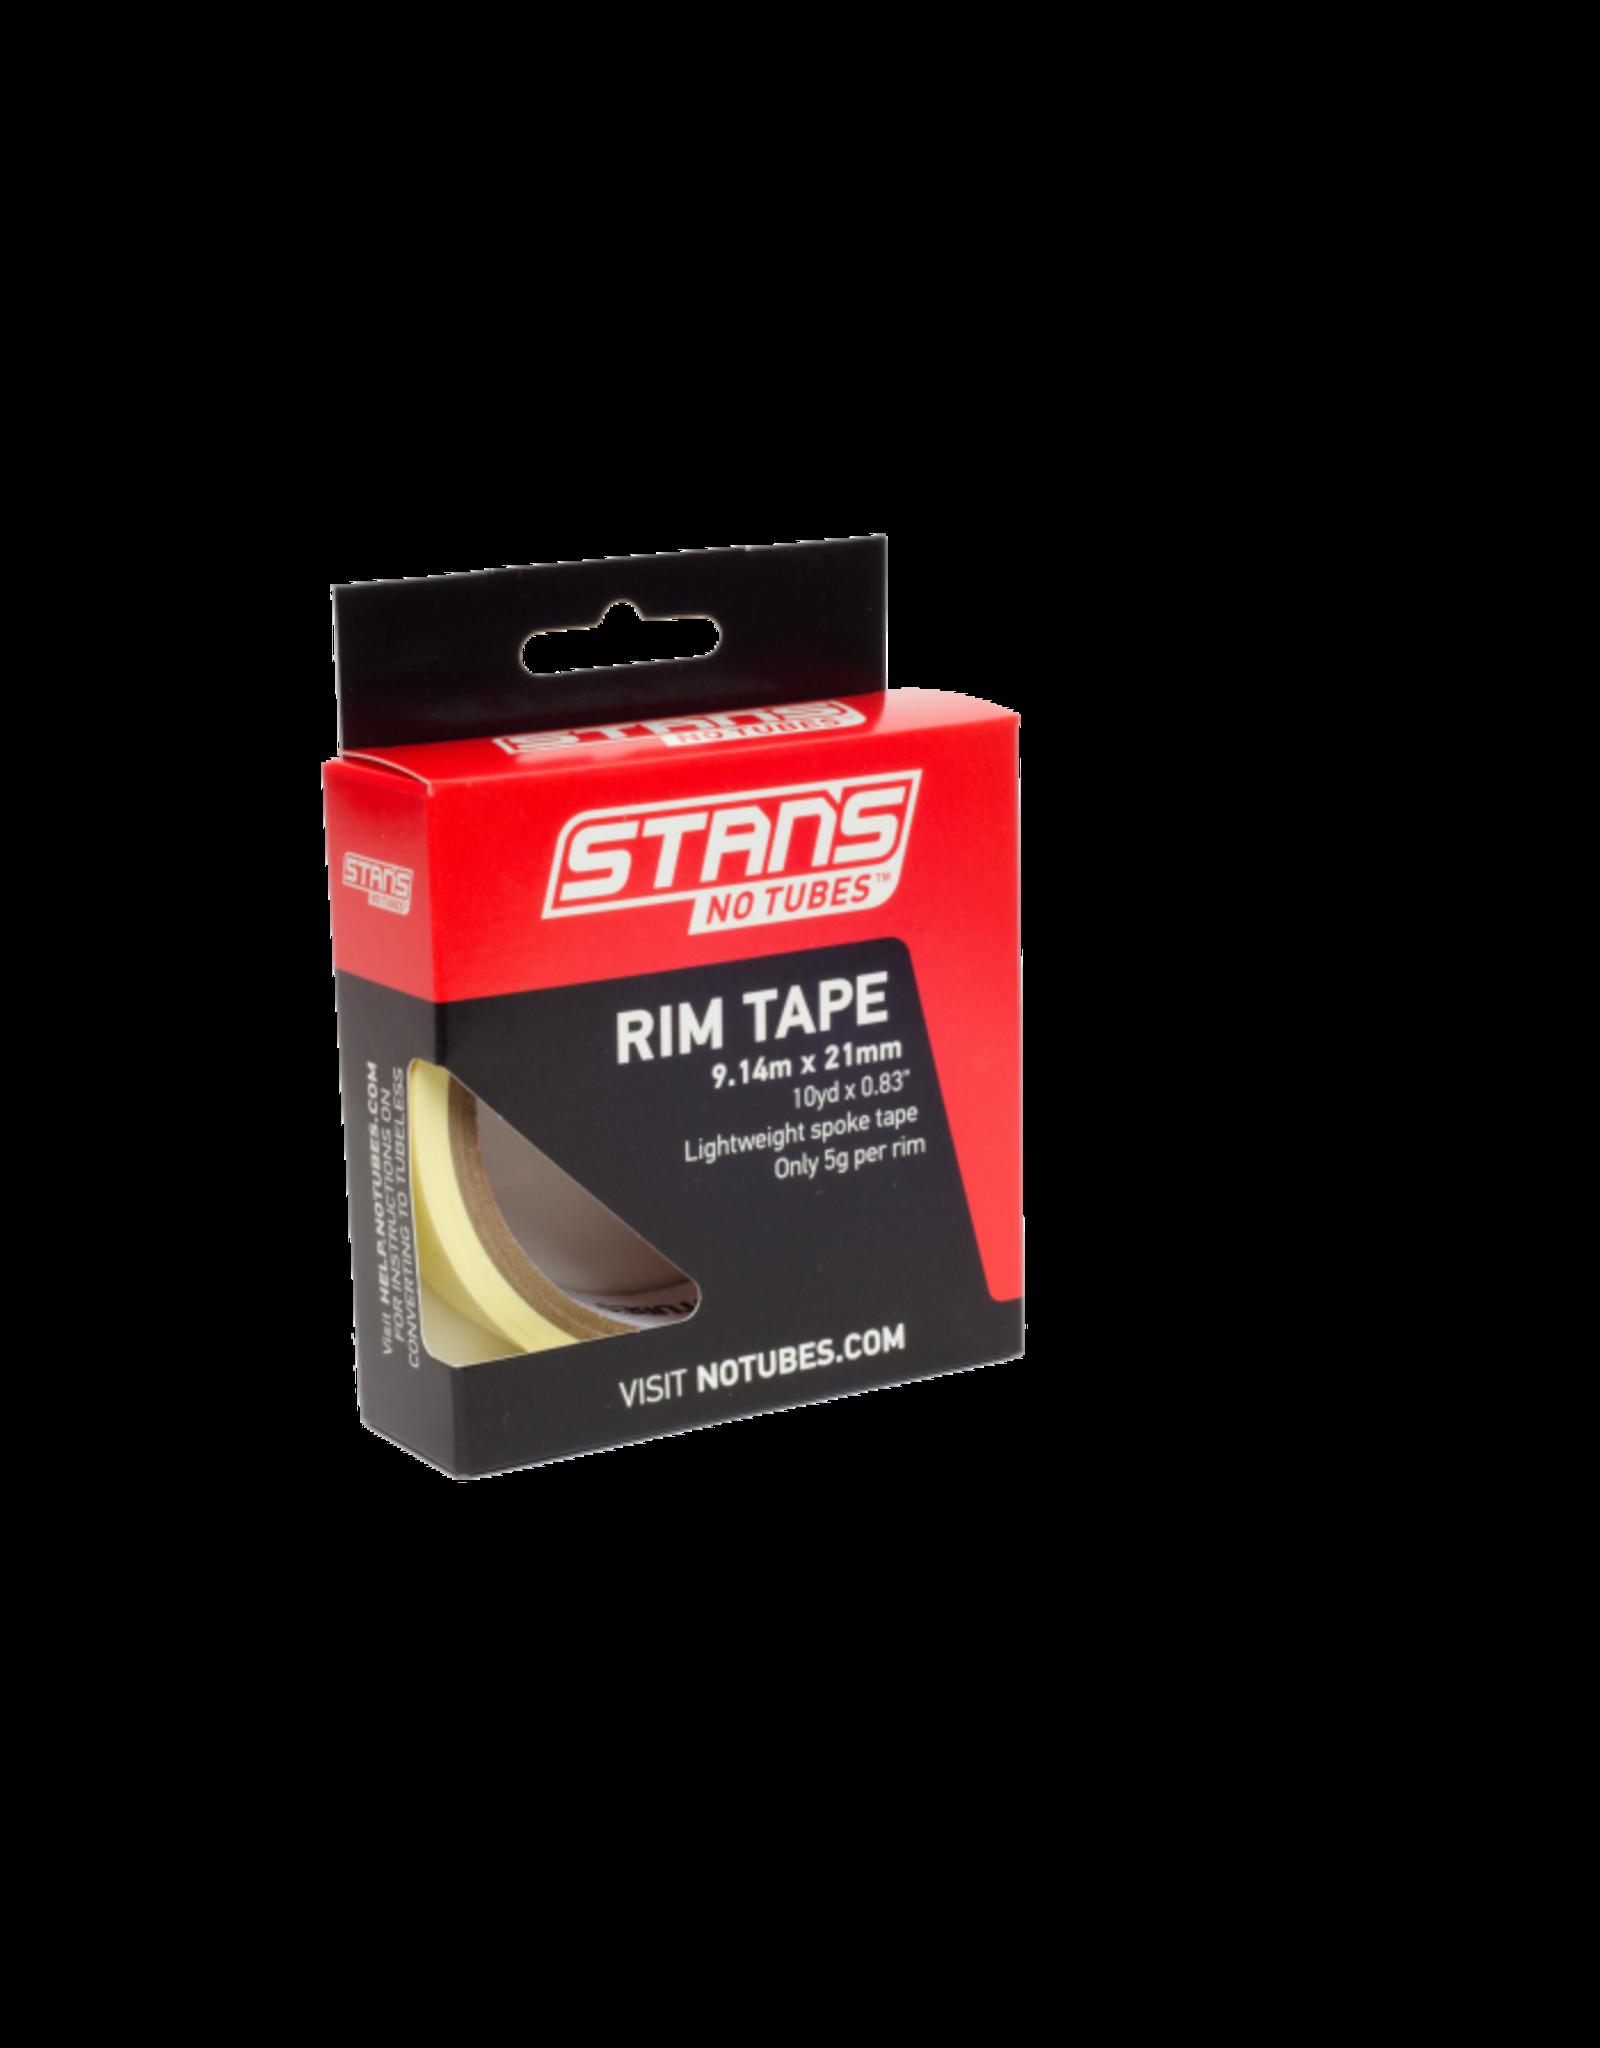 NO TUBES STAN'S, Rim Tape, 21mm